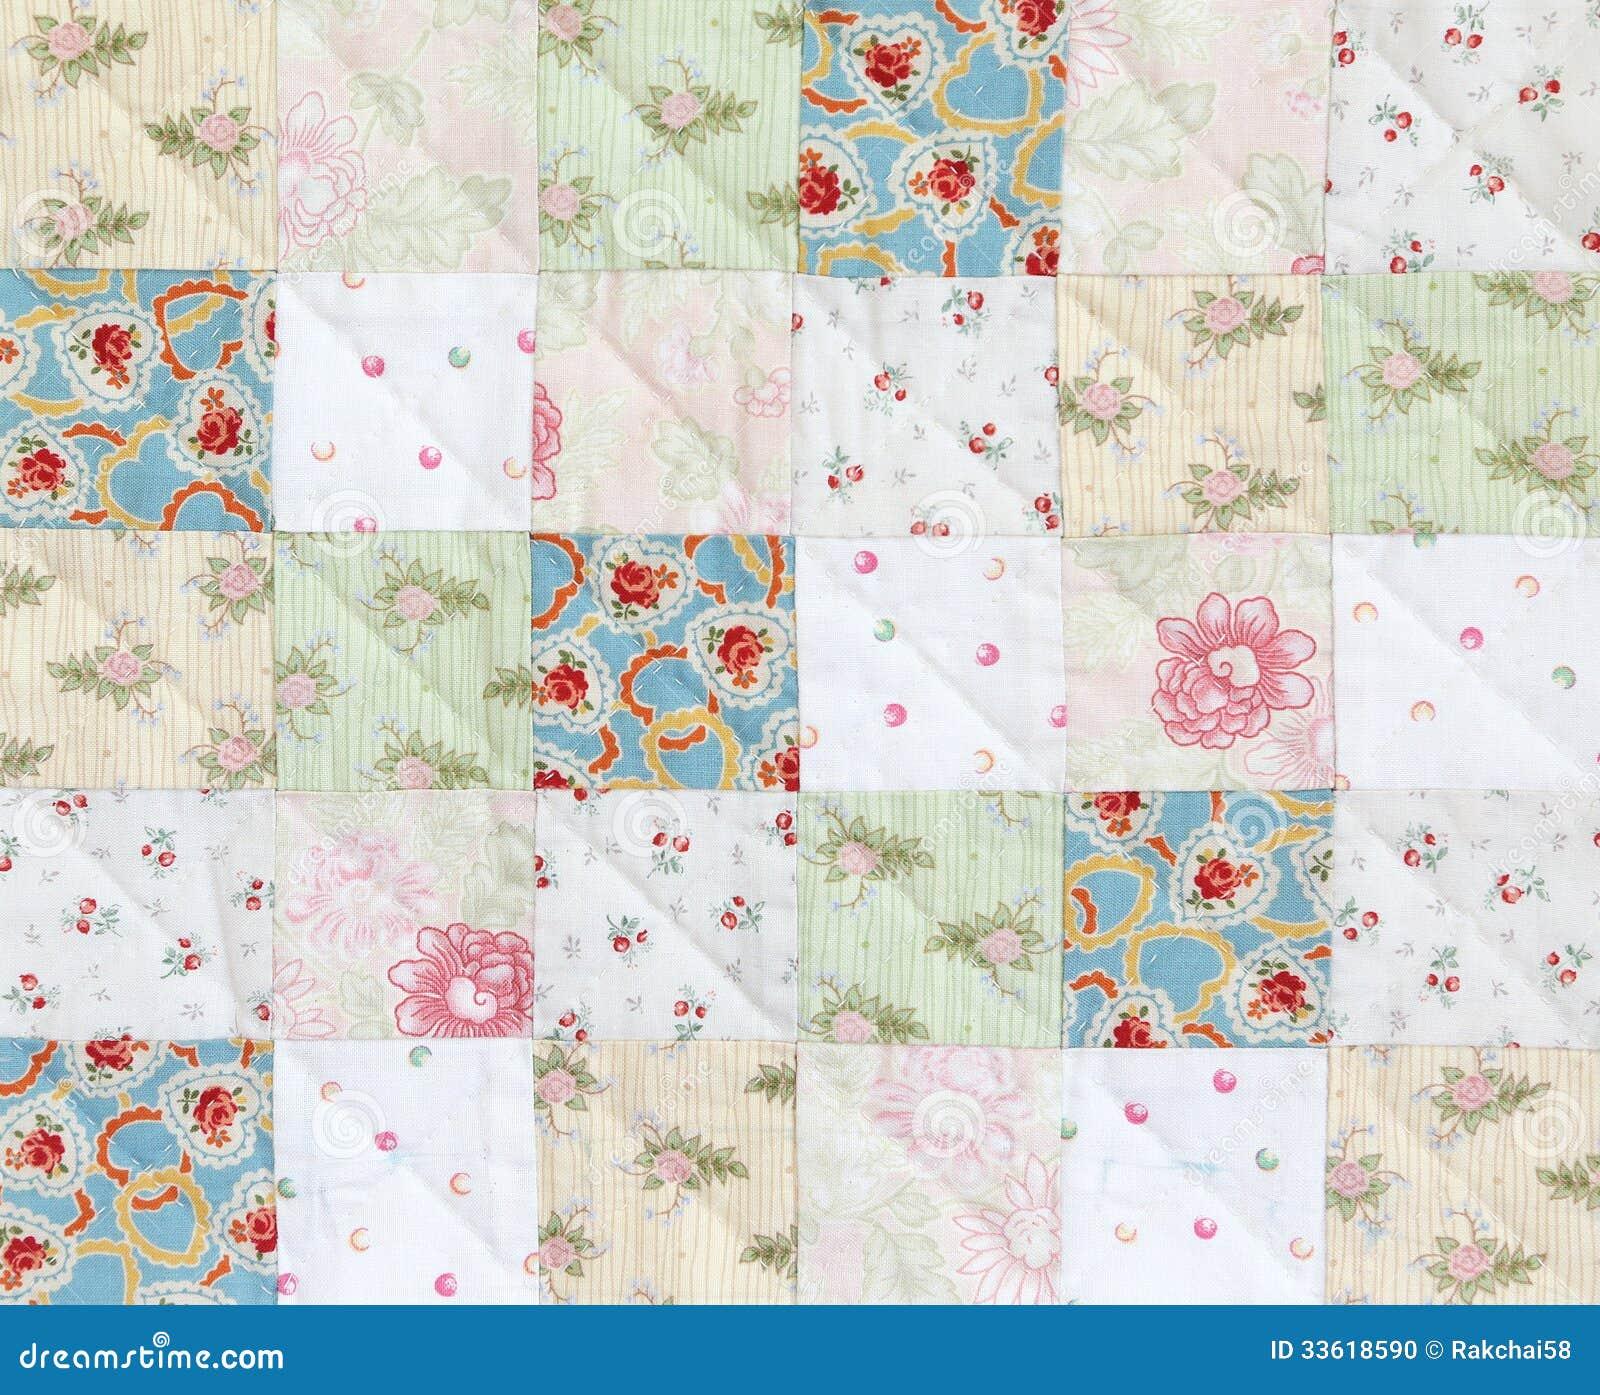 Patchwork Square Quilt Patterns: Patchwork Quilt Pattern Stock Photo